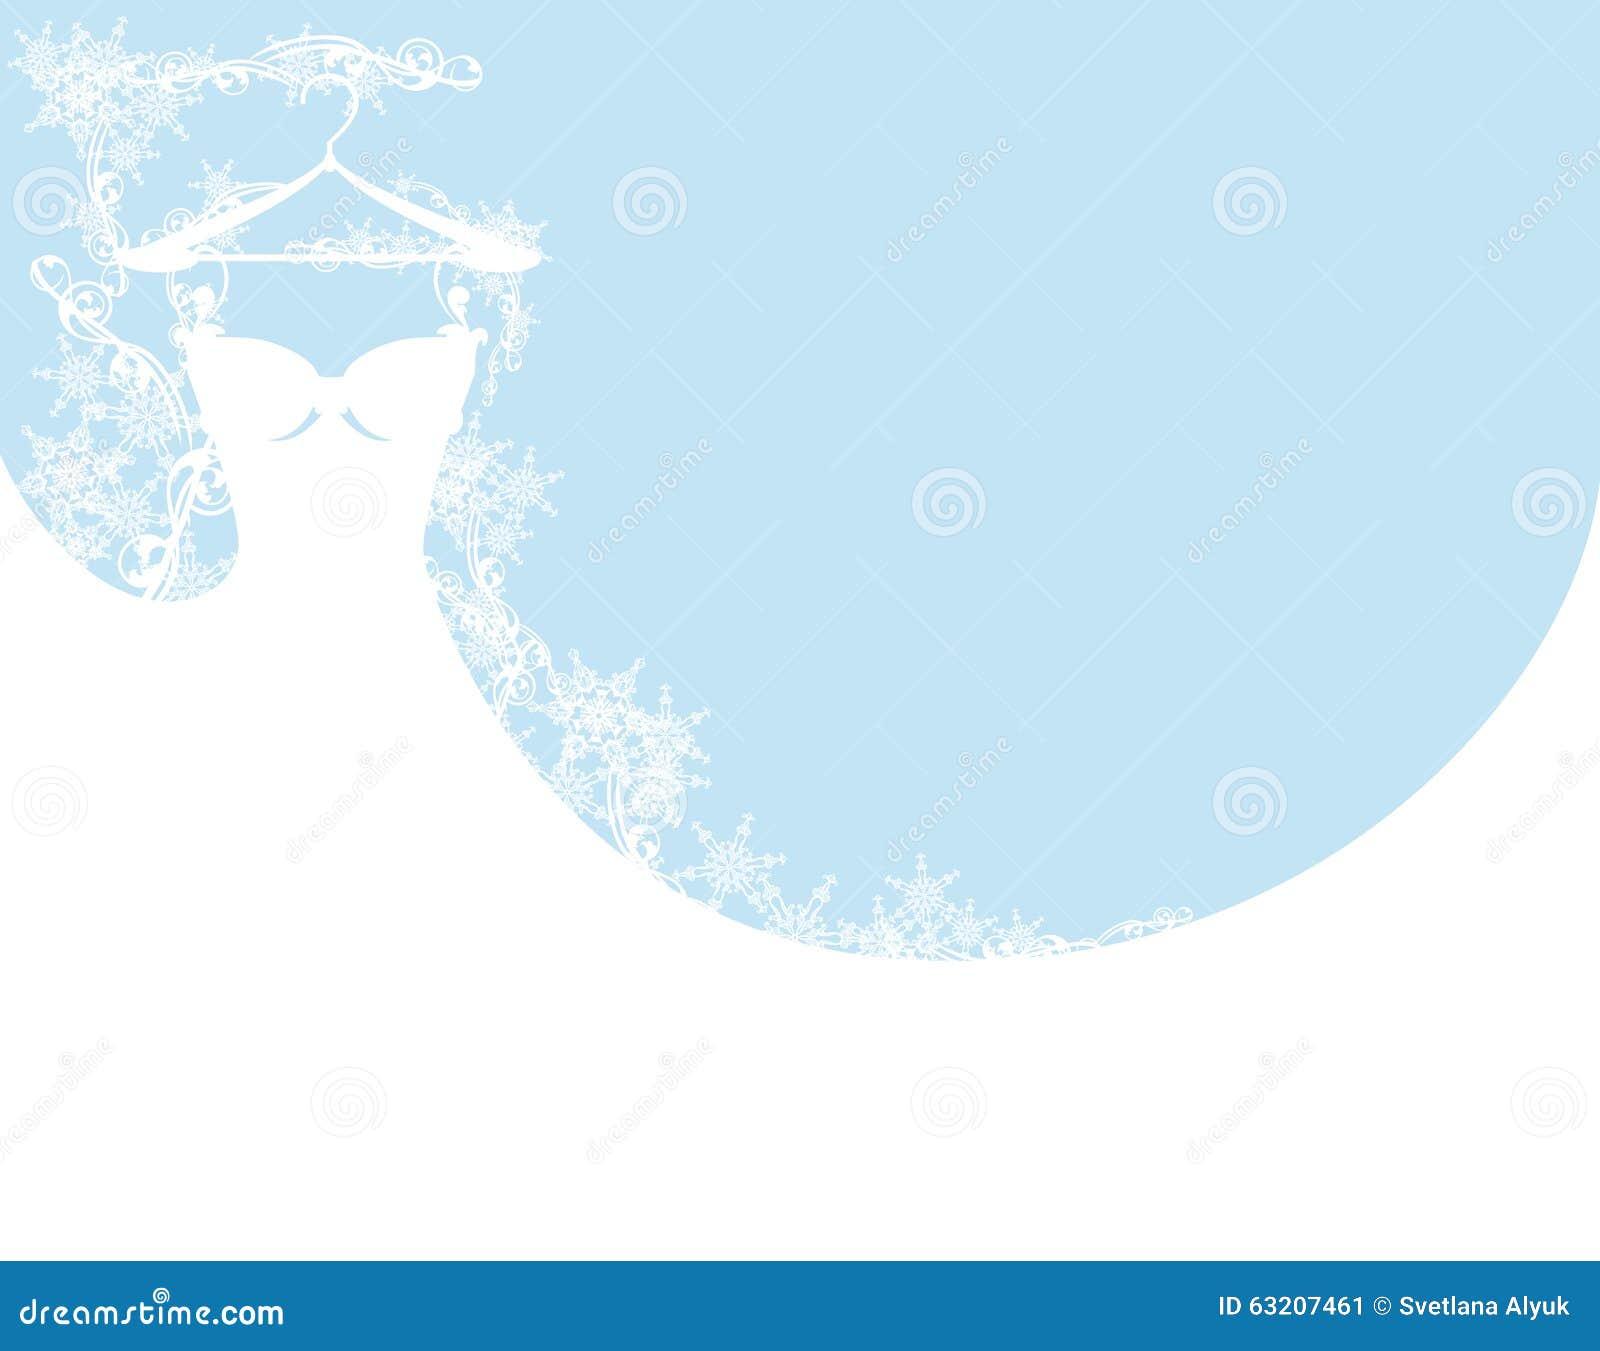 Wedding Dress Among Snowflakes Stock Vector Illustration Of Vector